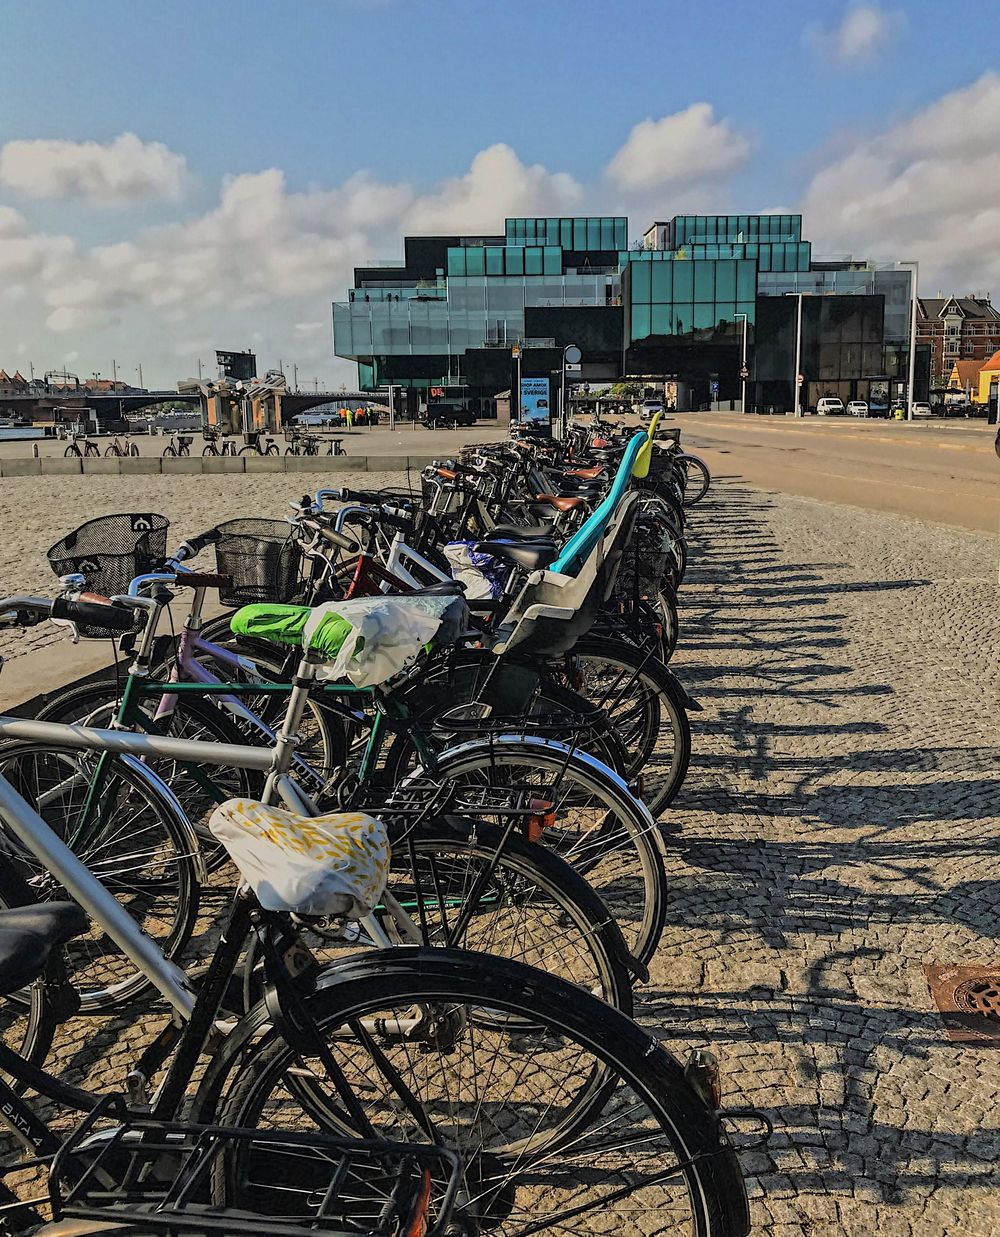 Copenhagen 2018 - image 2 - student project